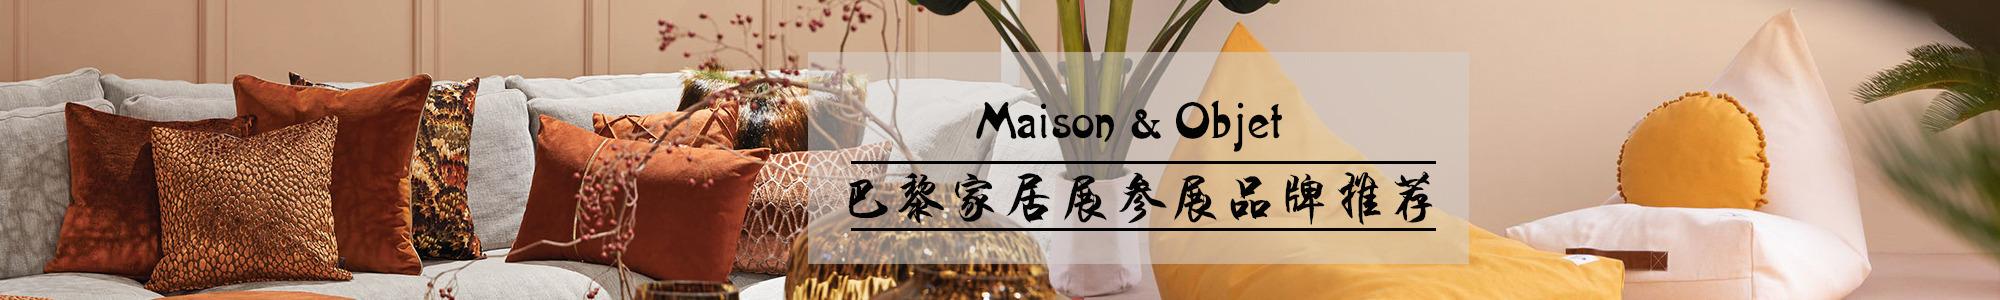 Maison&Obiet巴黎家居展